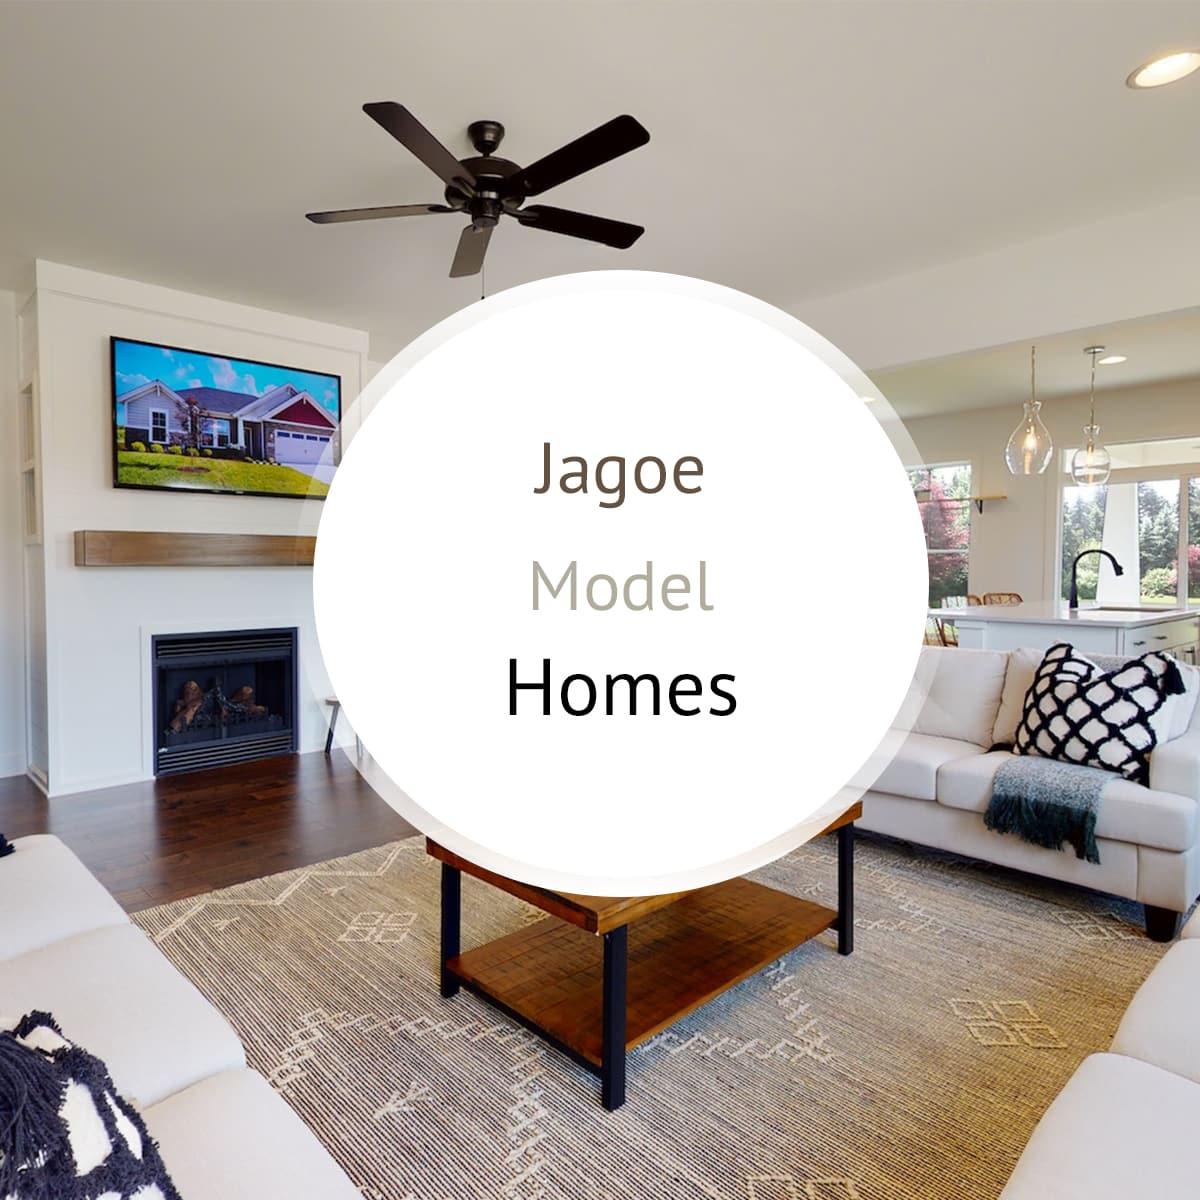 jagoe homes design pinterest